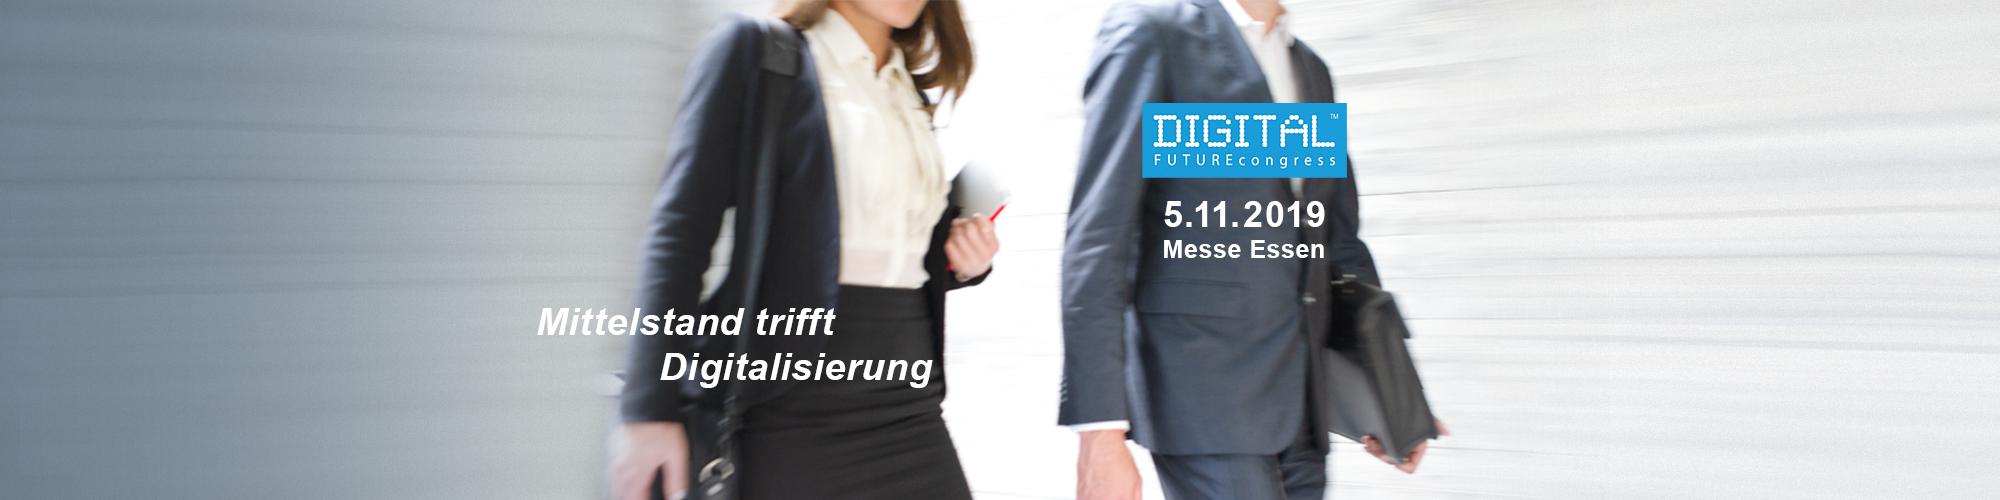 Slidermotiv Digital Future Congress Essen 2019